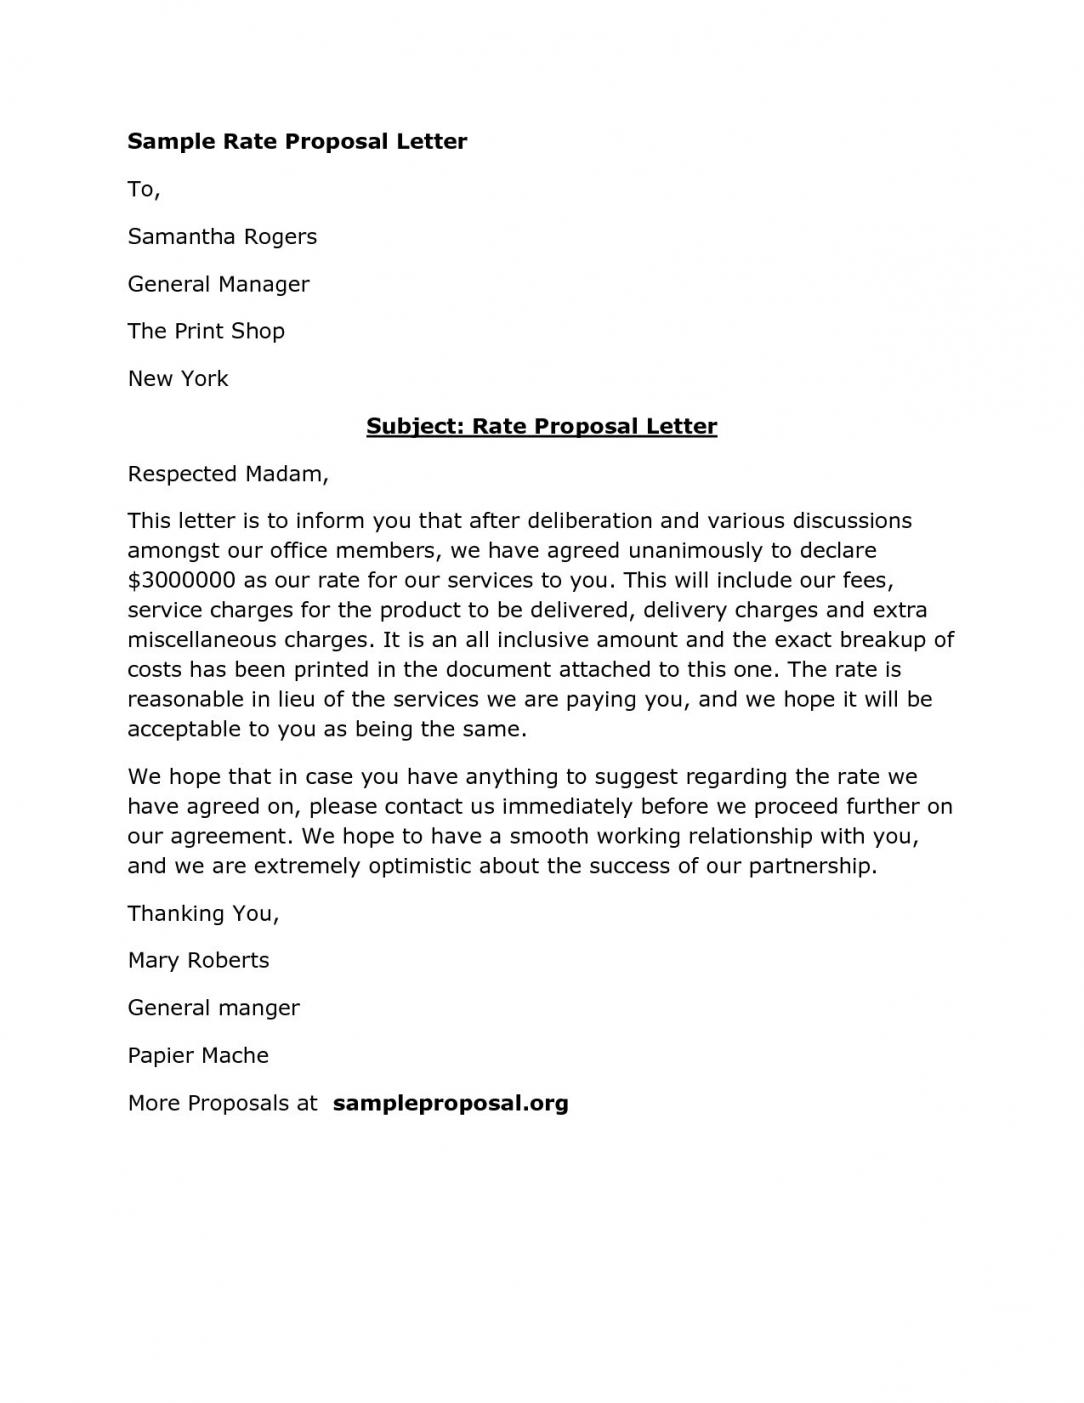 Business Partnership Proposal Letter Template